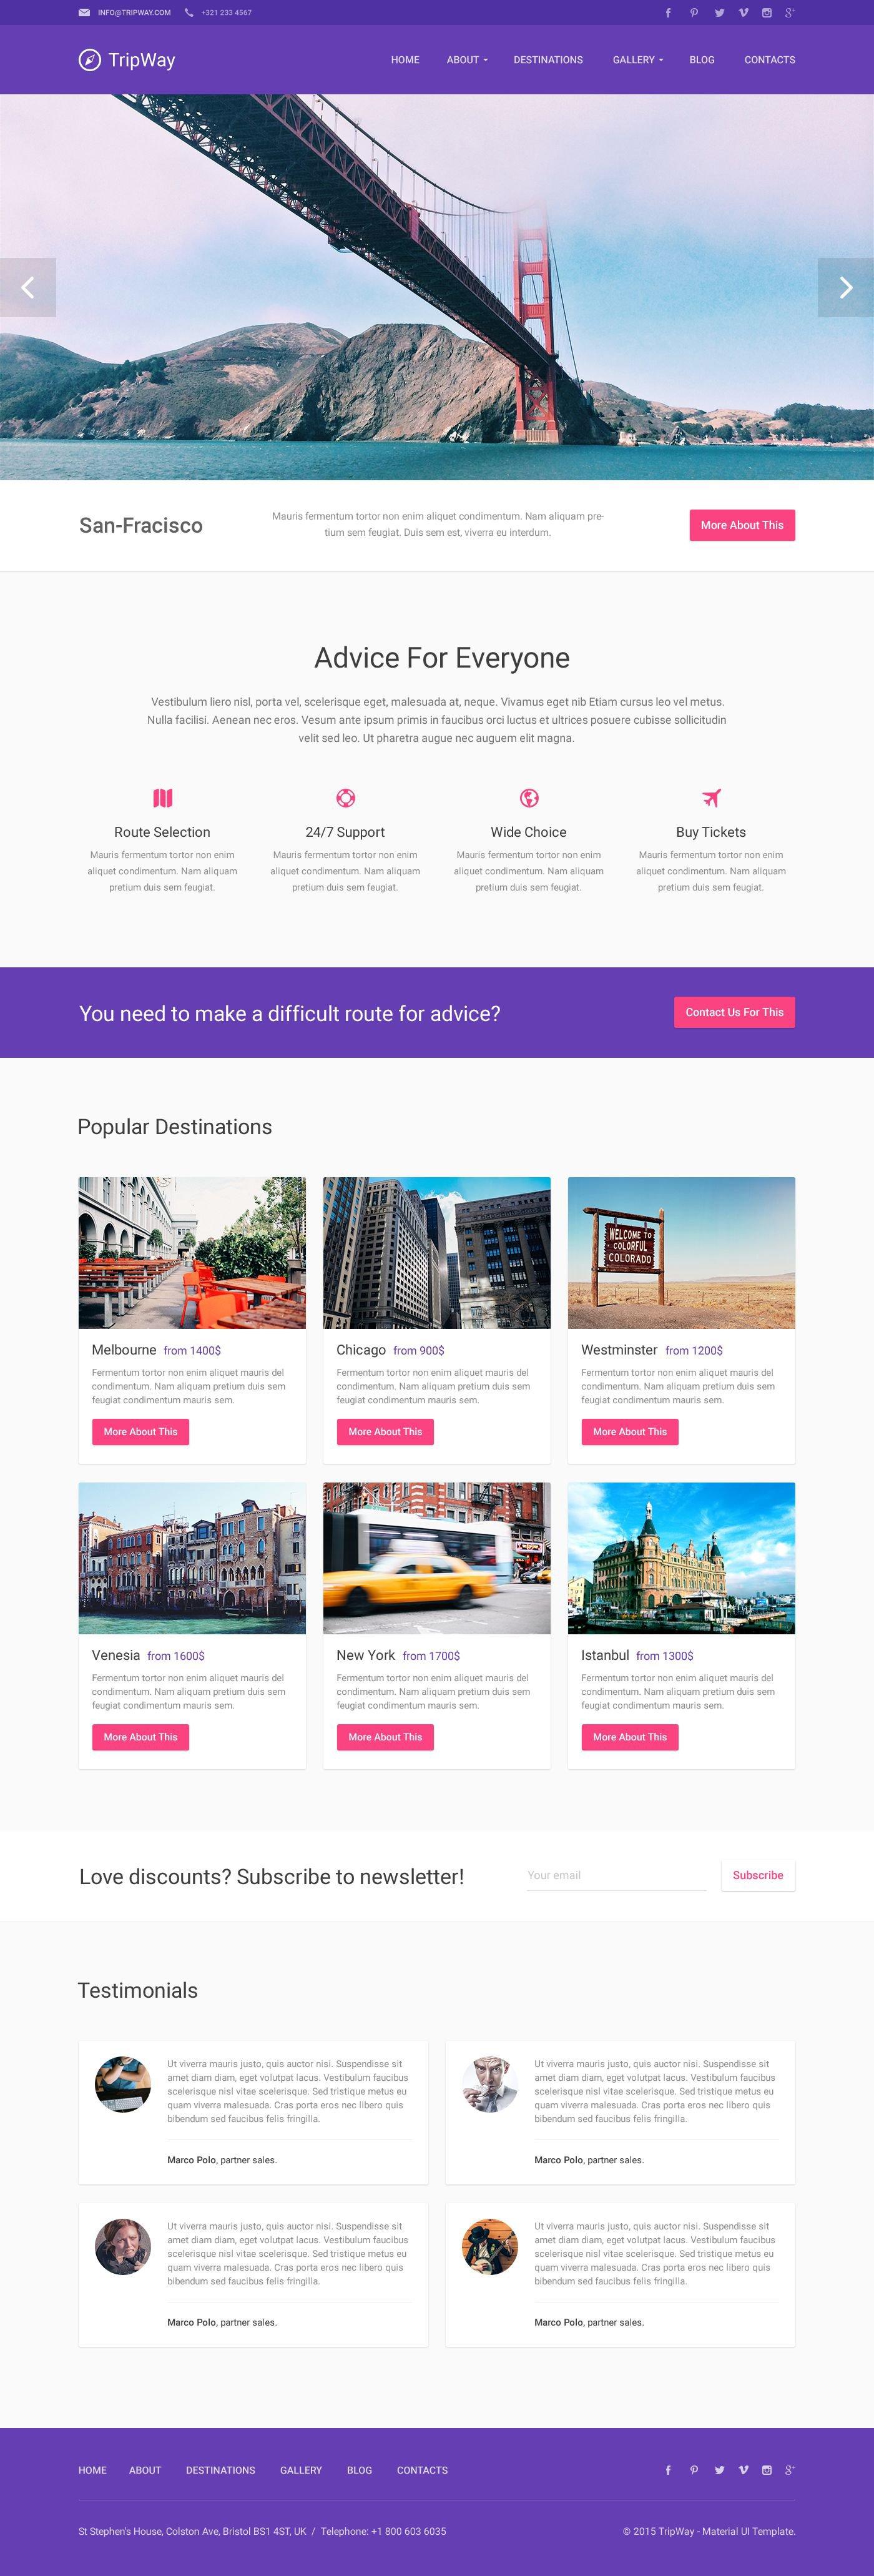 Travel Agency Responsive WordPress Theme - screenshot